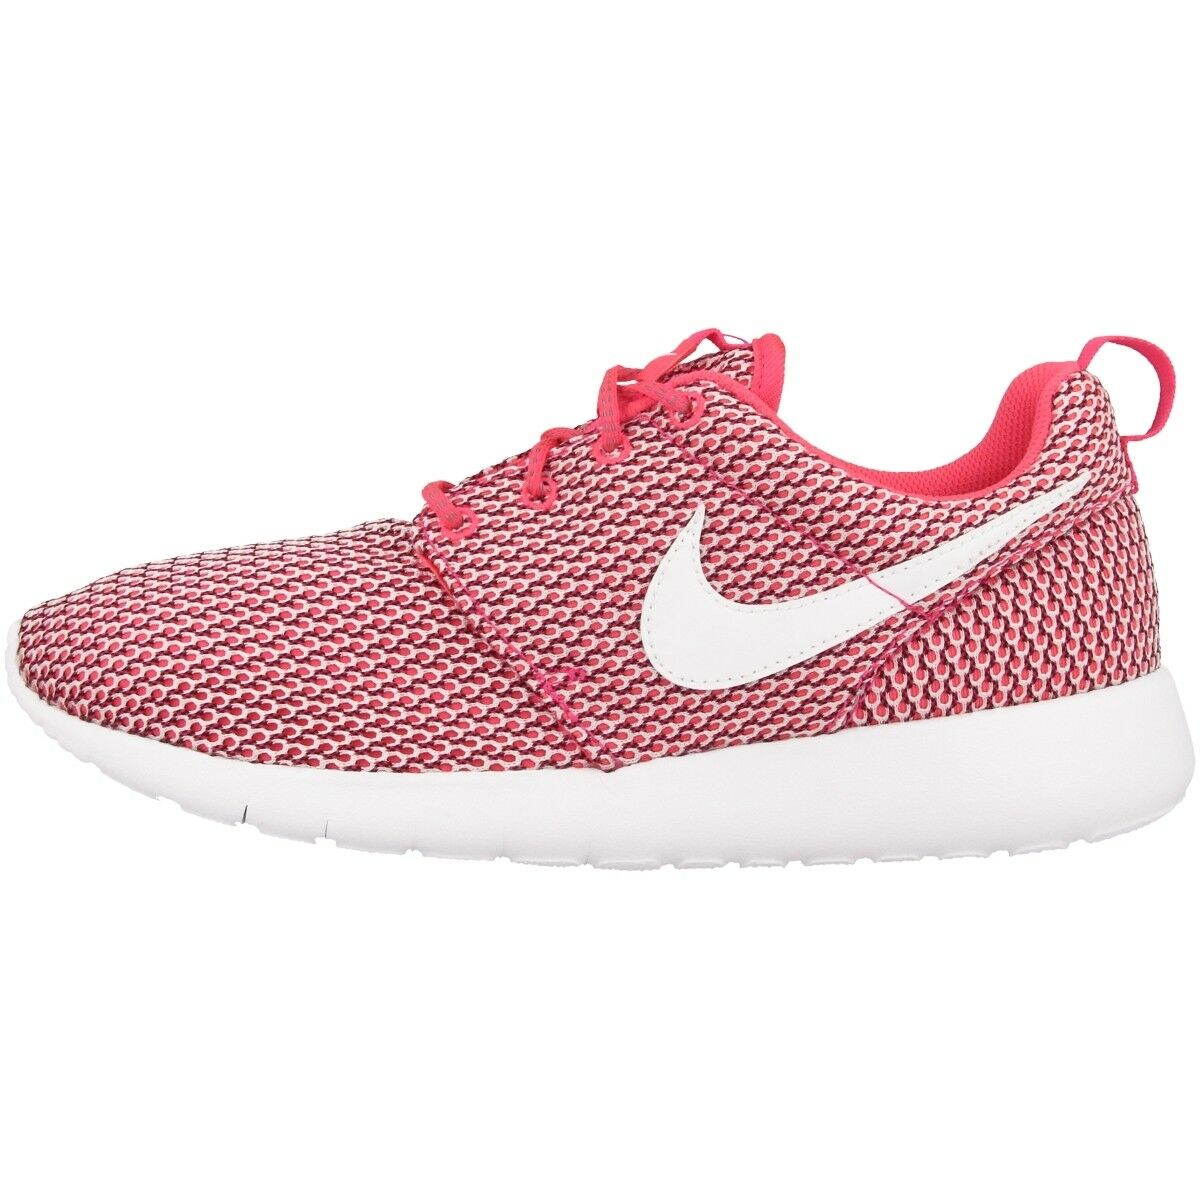 Nike roshe one GS zapatos zapatillas rosheone Pink White Rosherun Thea 599729-615